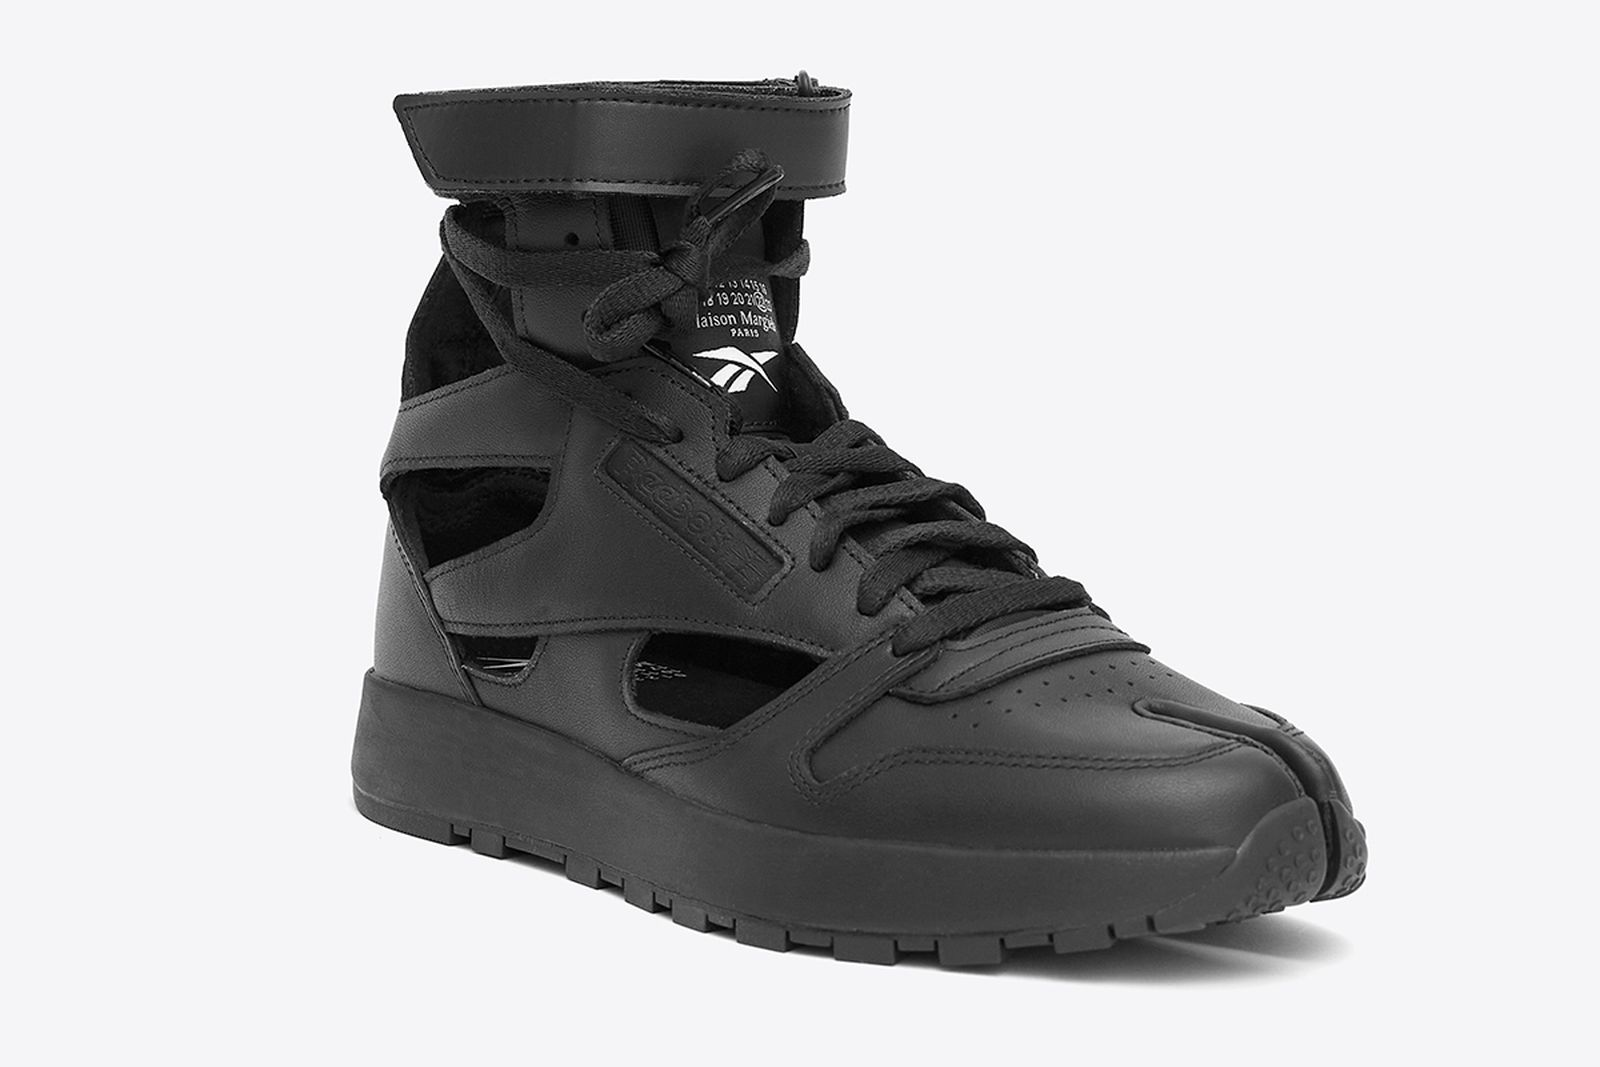 Maison Margiela Reebok Classic Leather Tabi High (9)